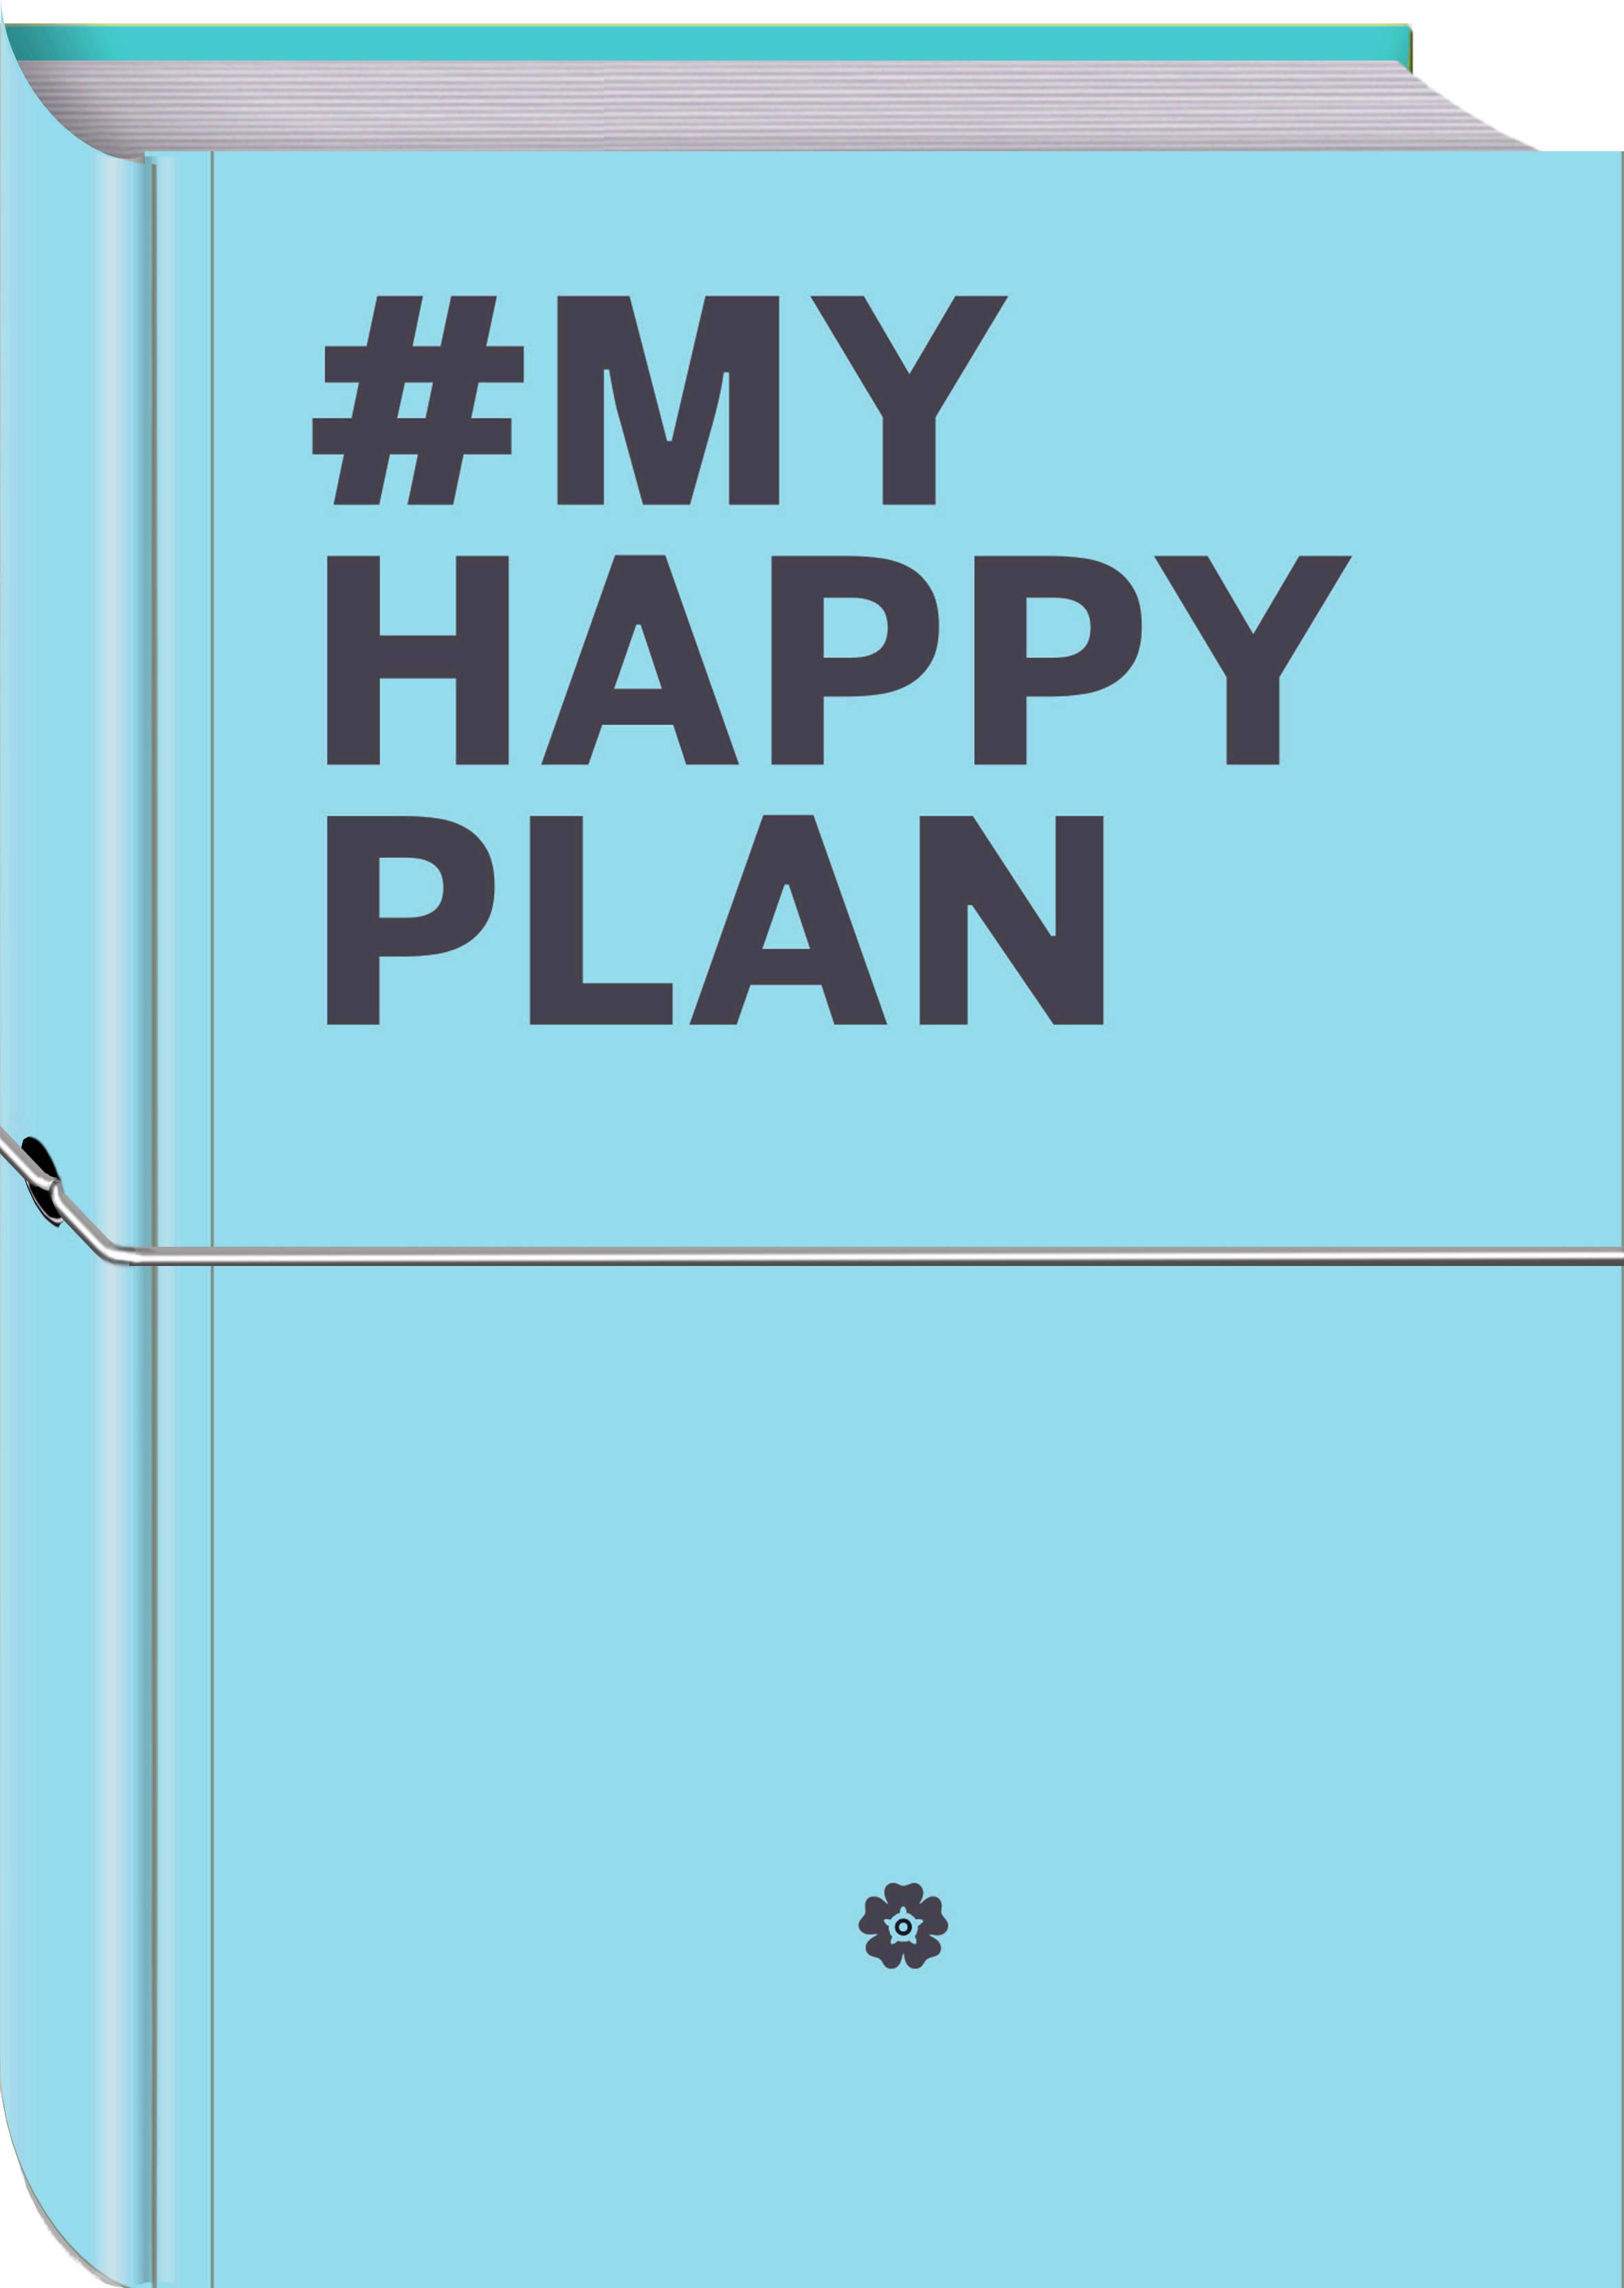 My Happy Plan (Морской) (большой формат 165х240, лента ляссе, серебряная резинка) my happy plan морской